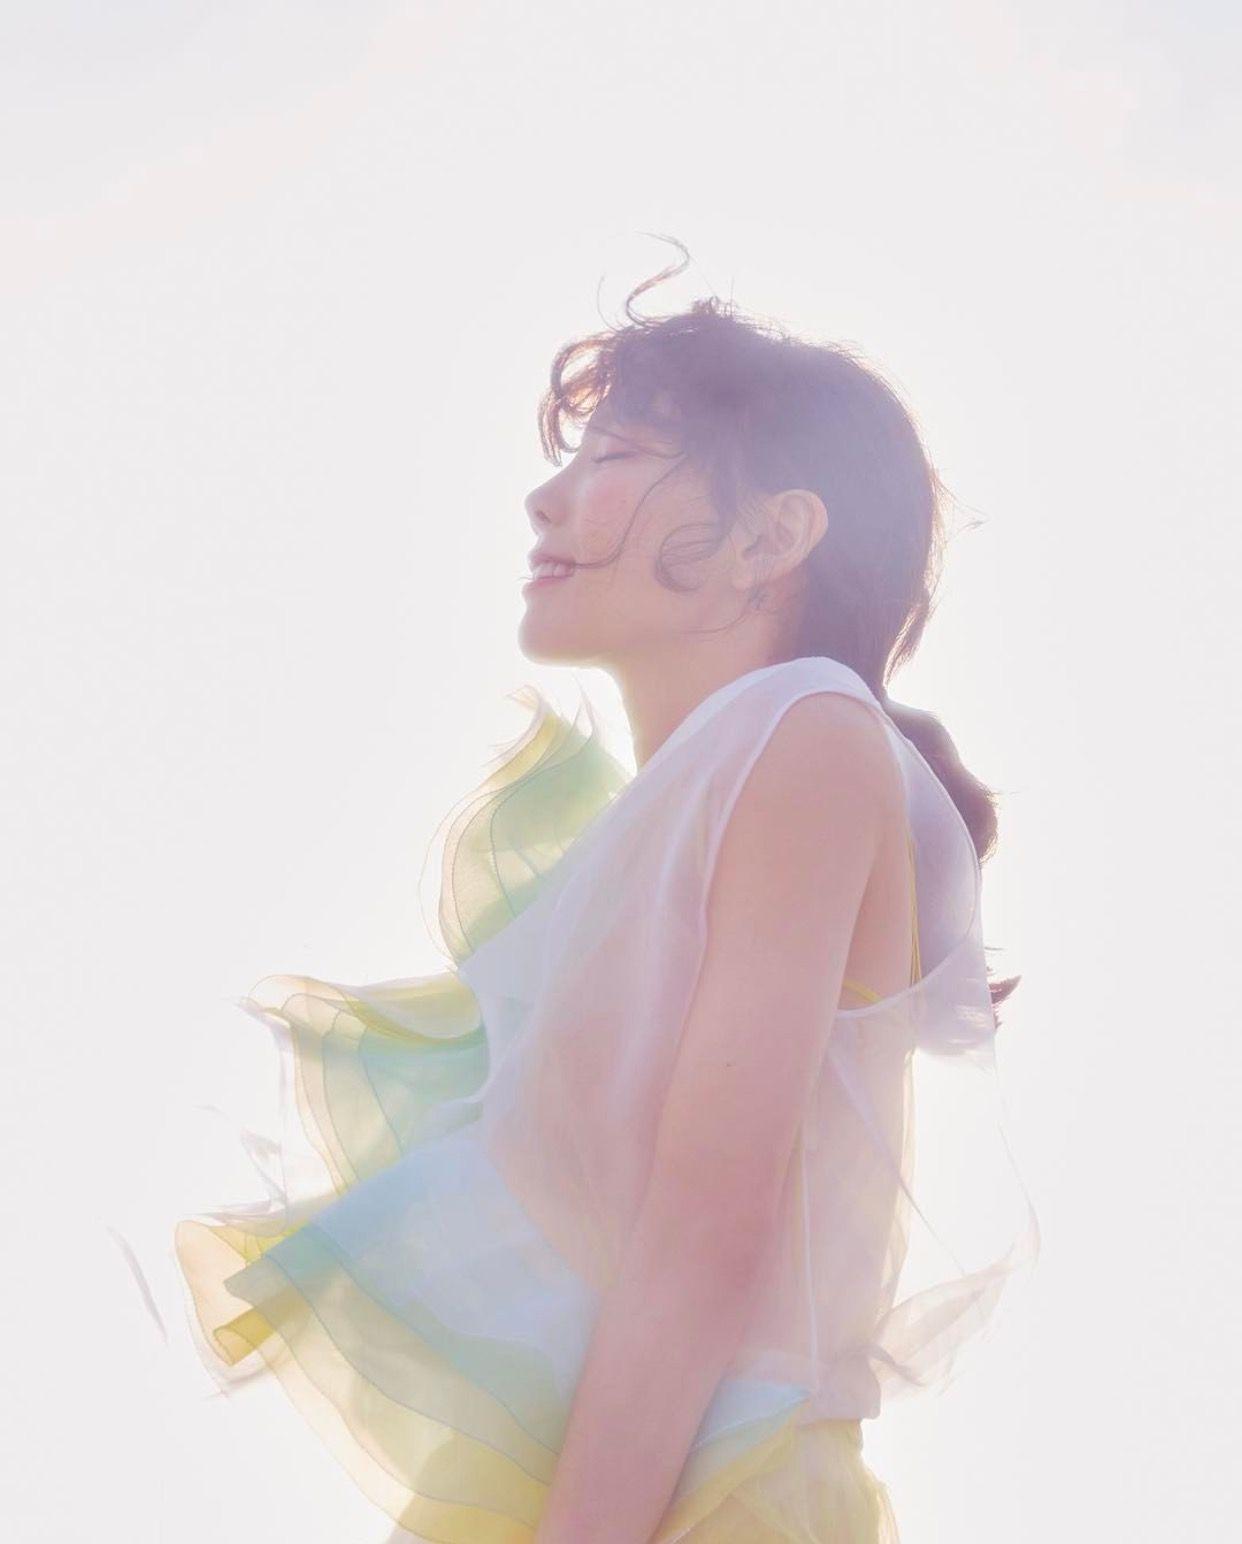 Ca sĩ Taeyeon mặc đầm voan pastel trong MV Make Me Love You